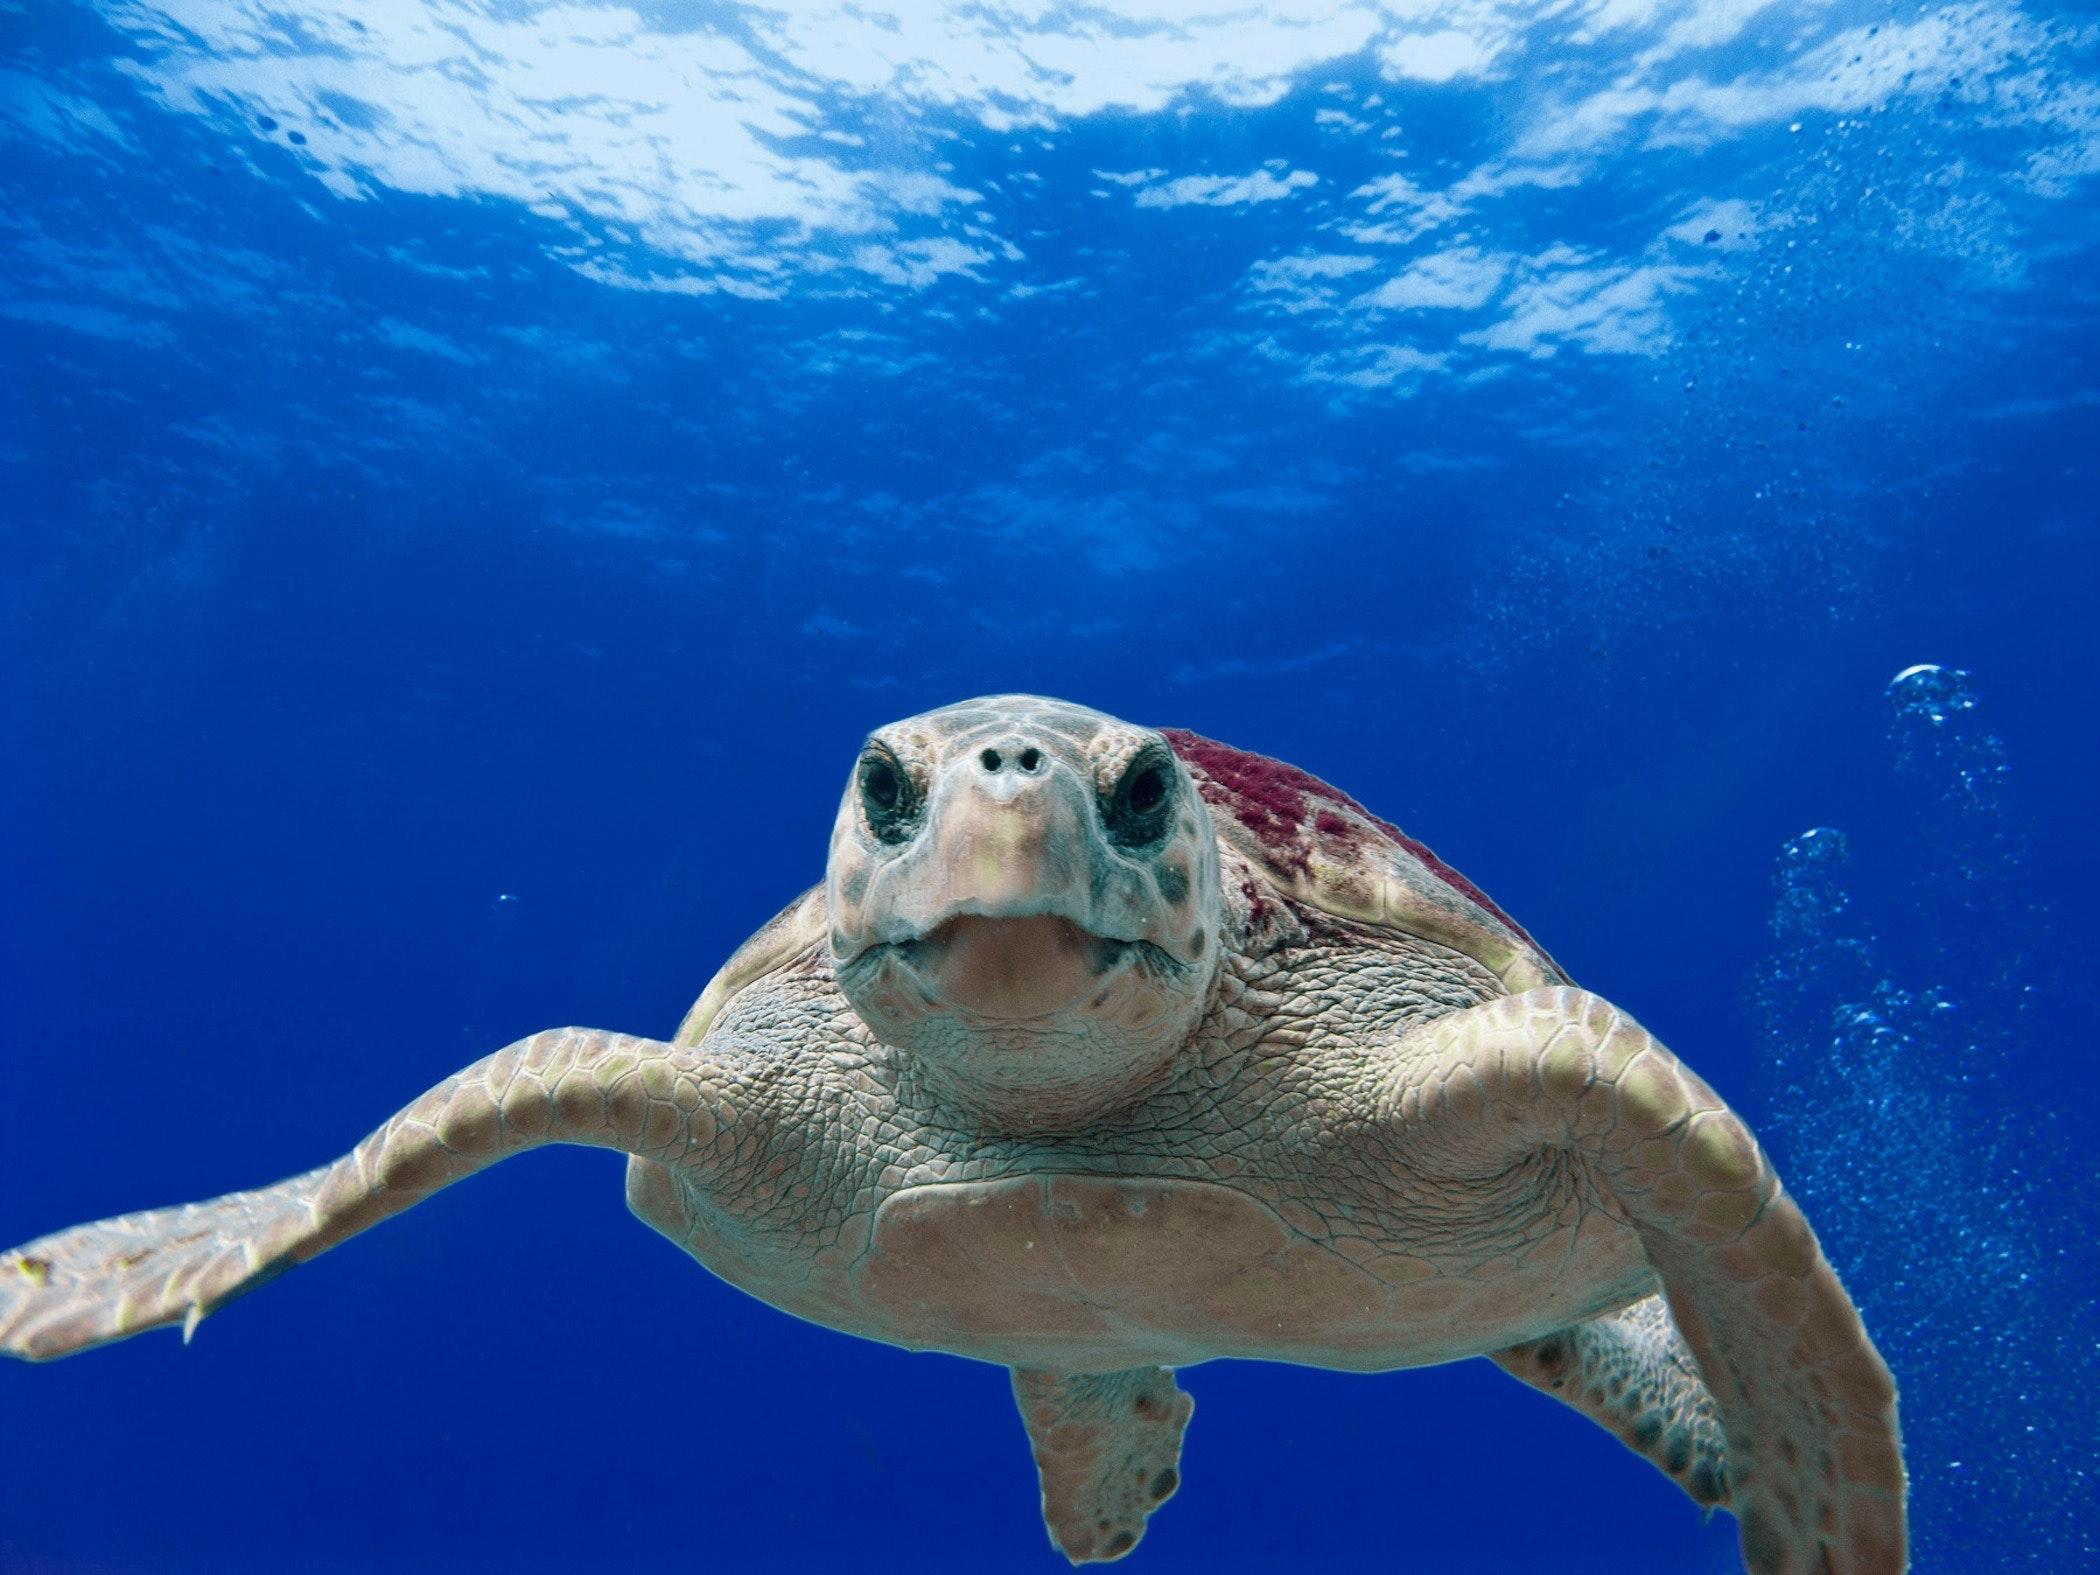 animal-close-up-ocean-68744.jpg